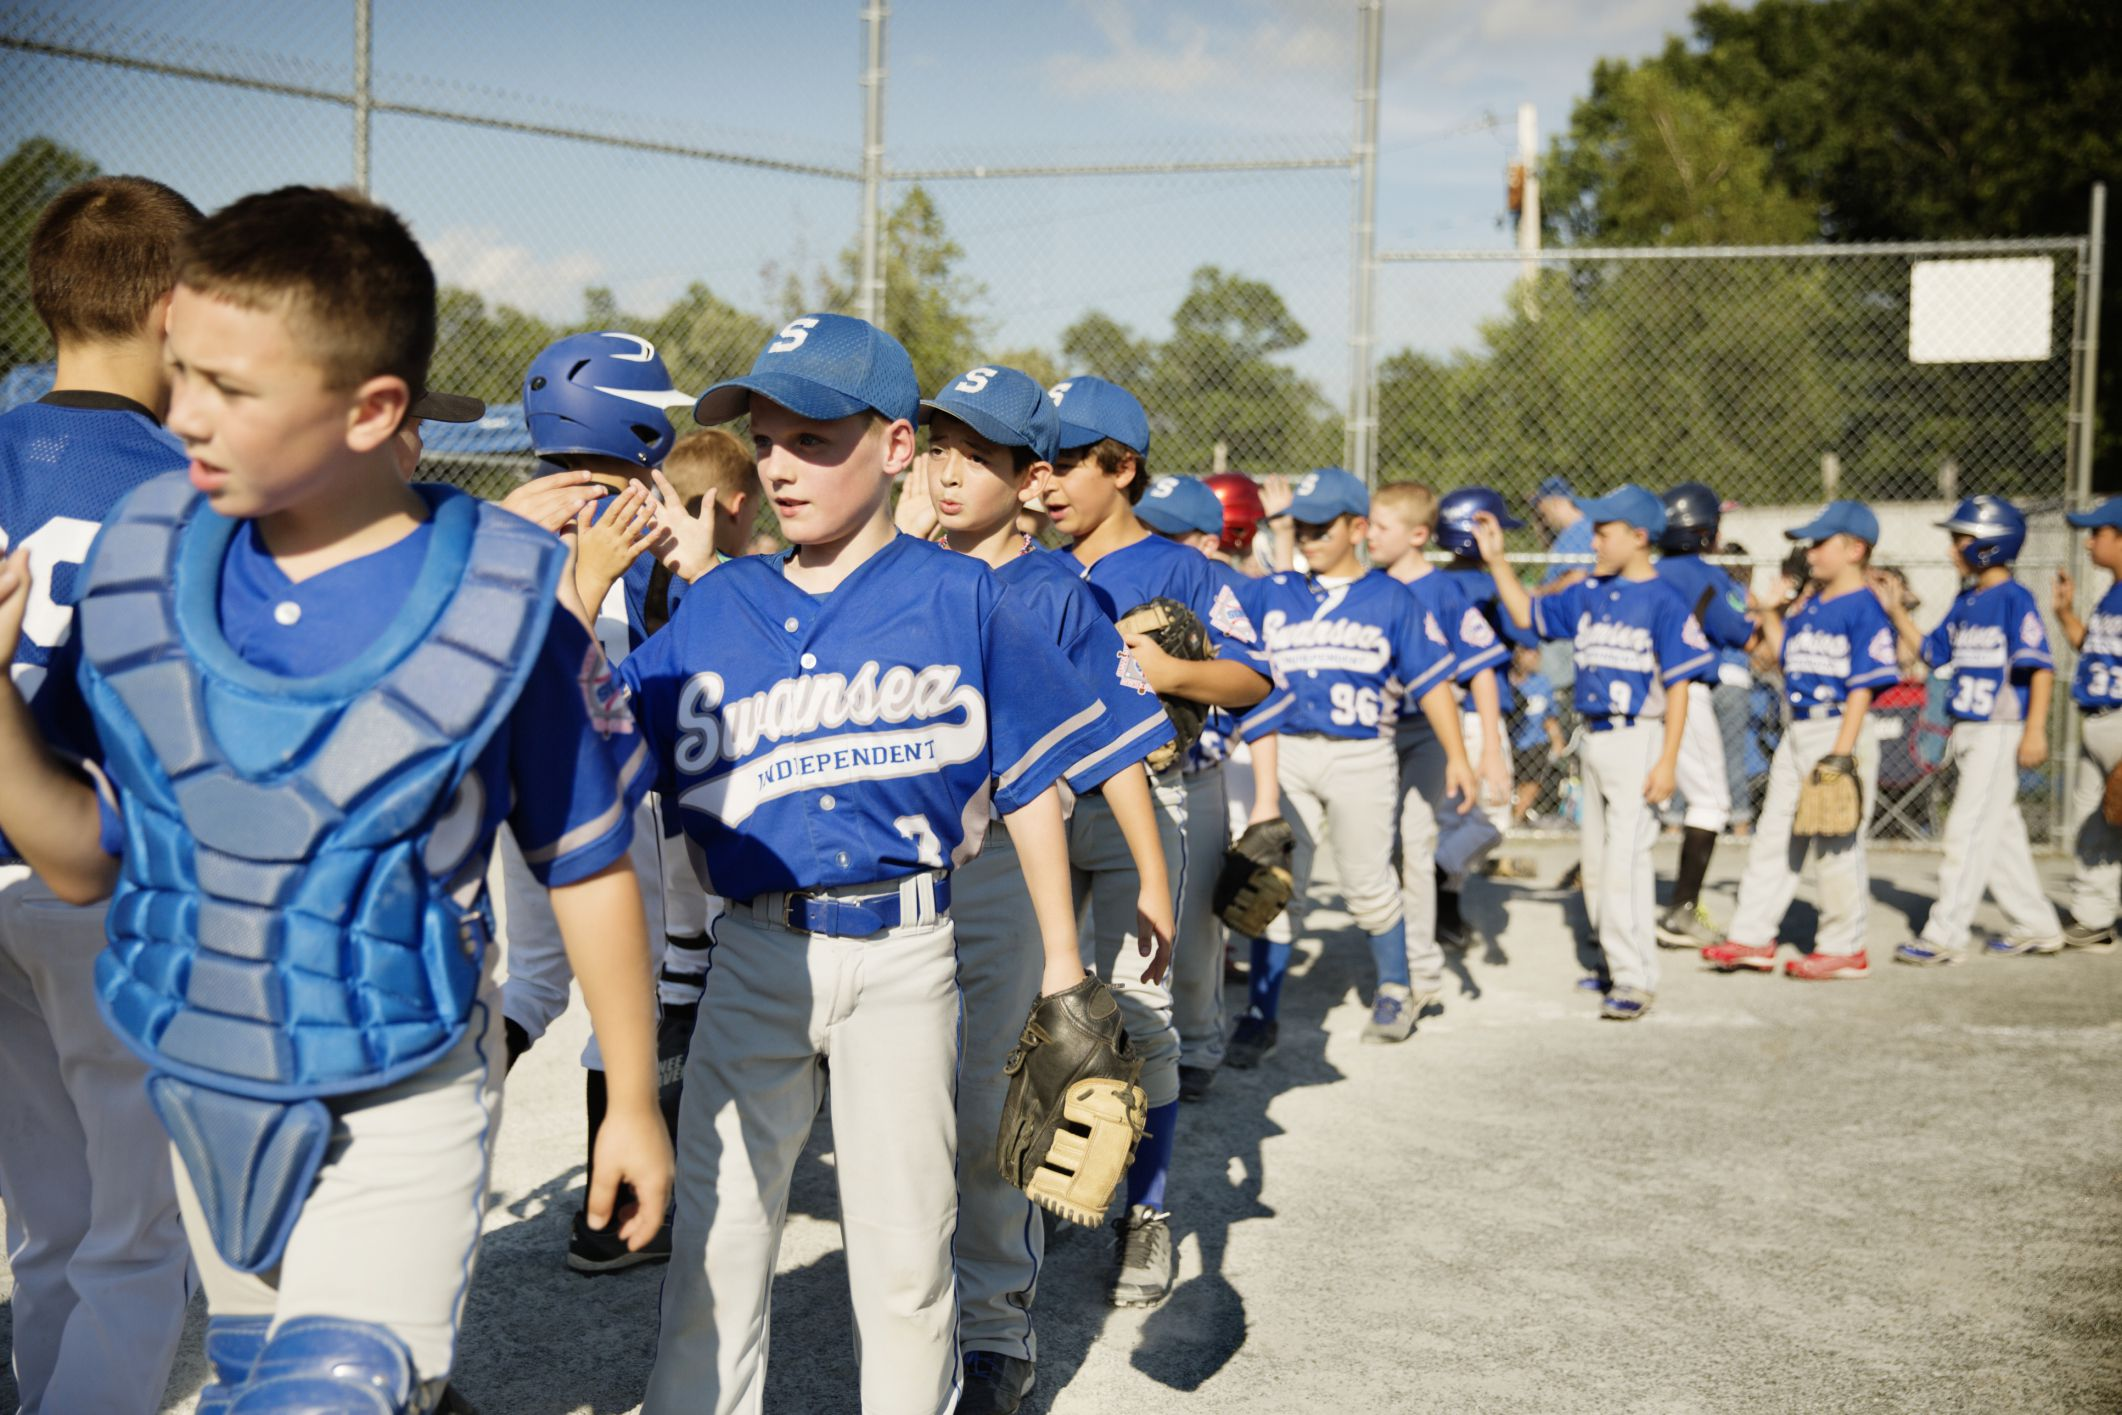 Teaching Kids Good Sportsmanship